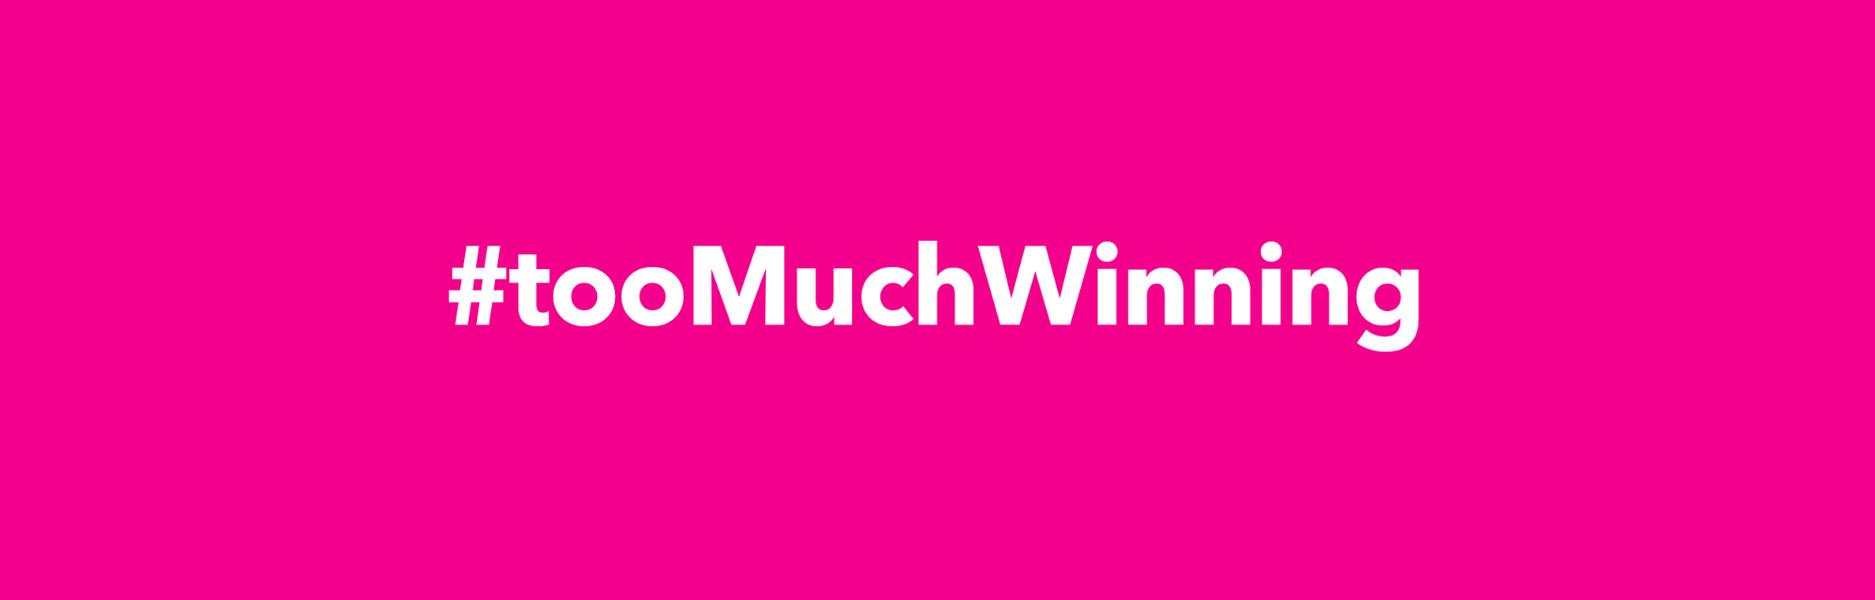 #tooMuchWinning